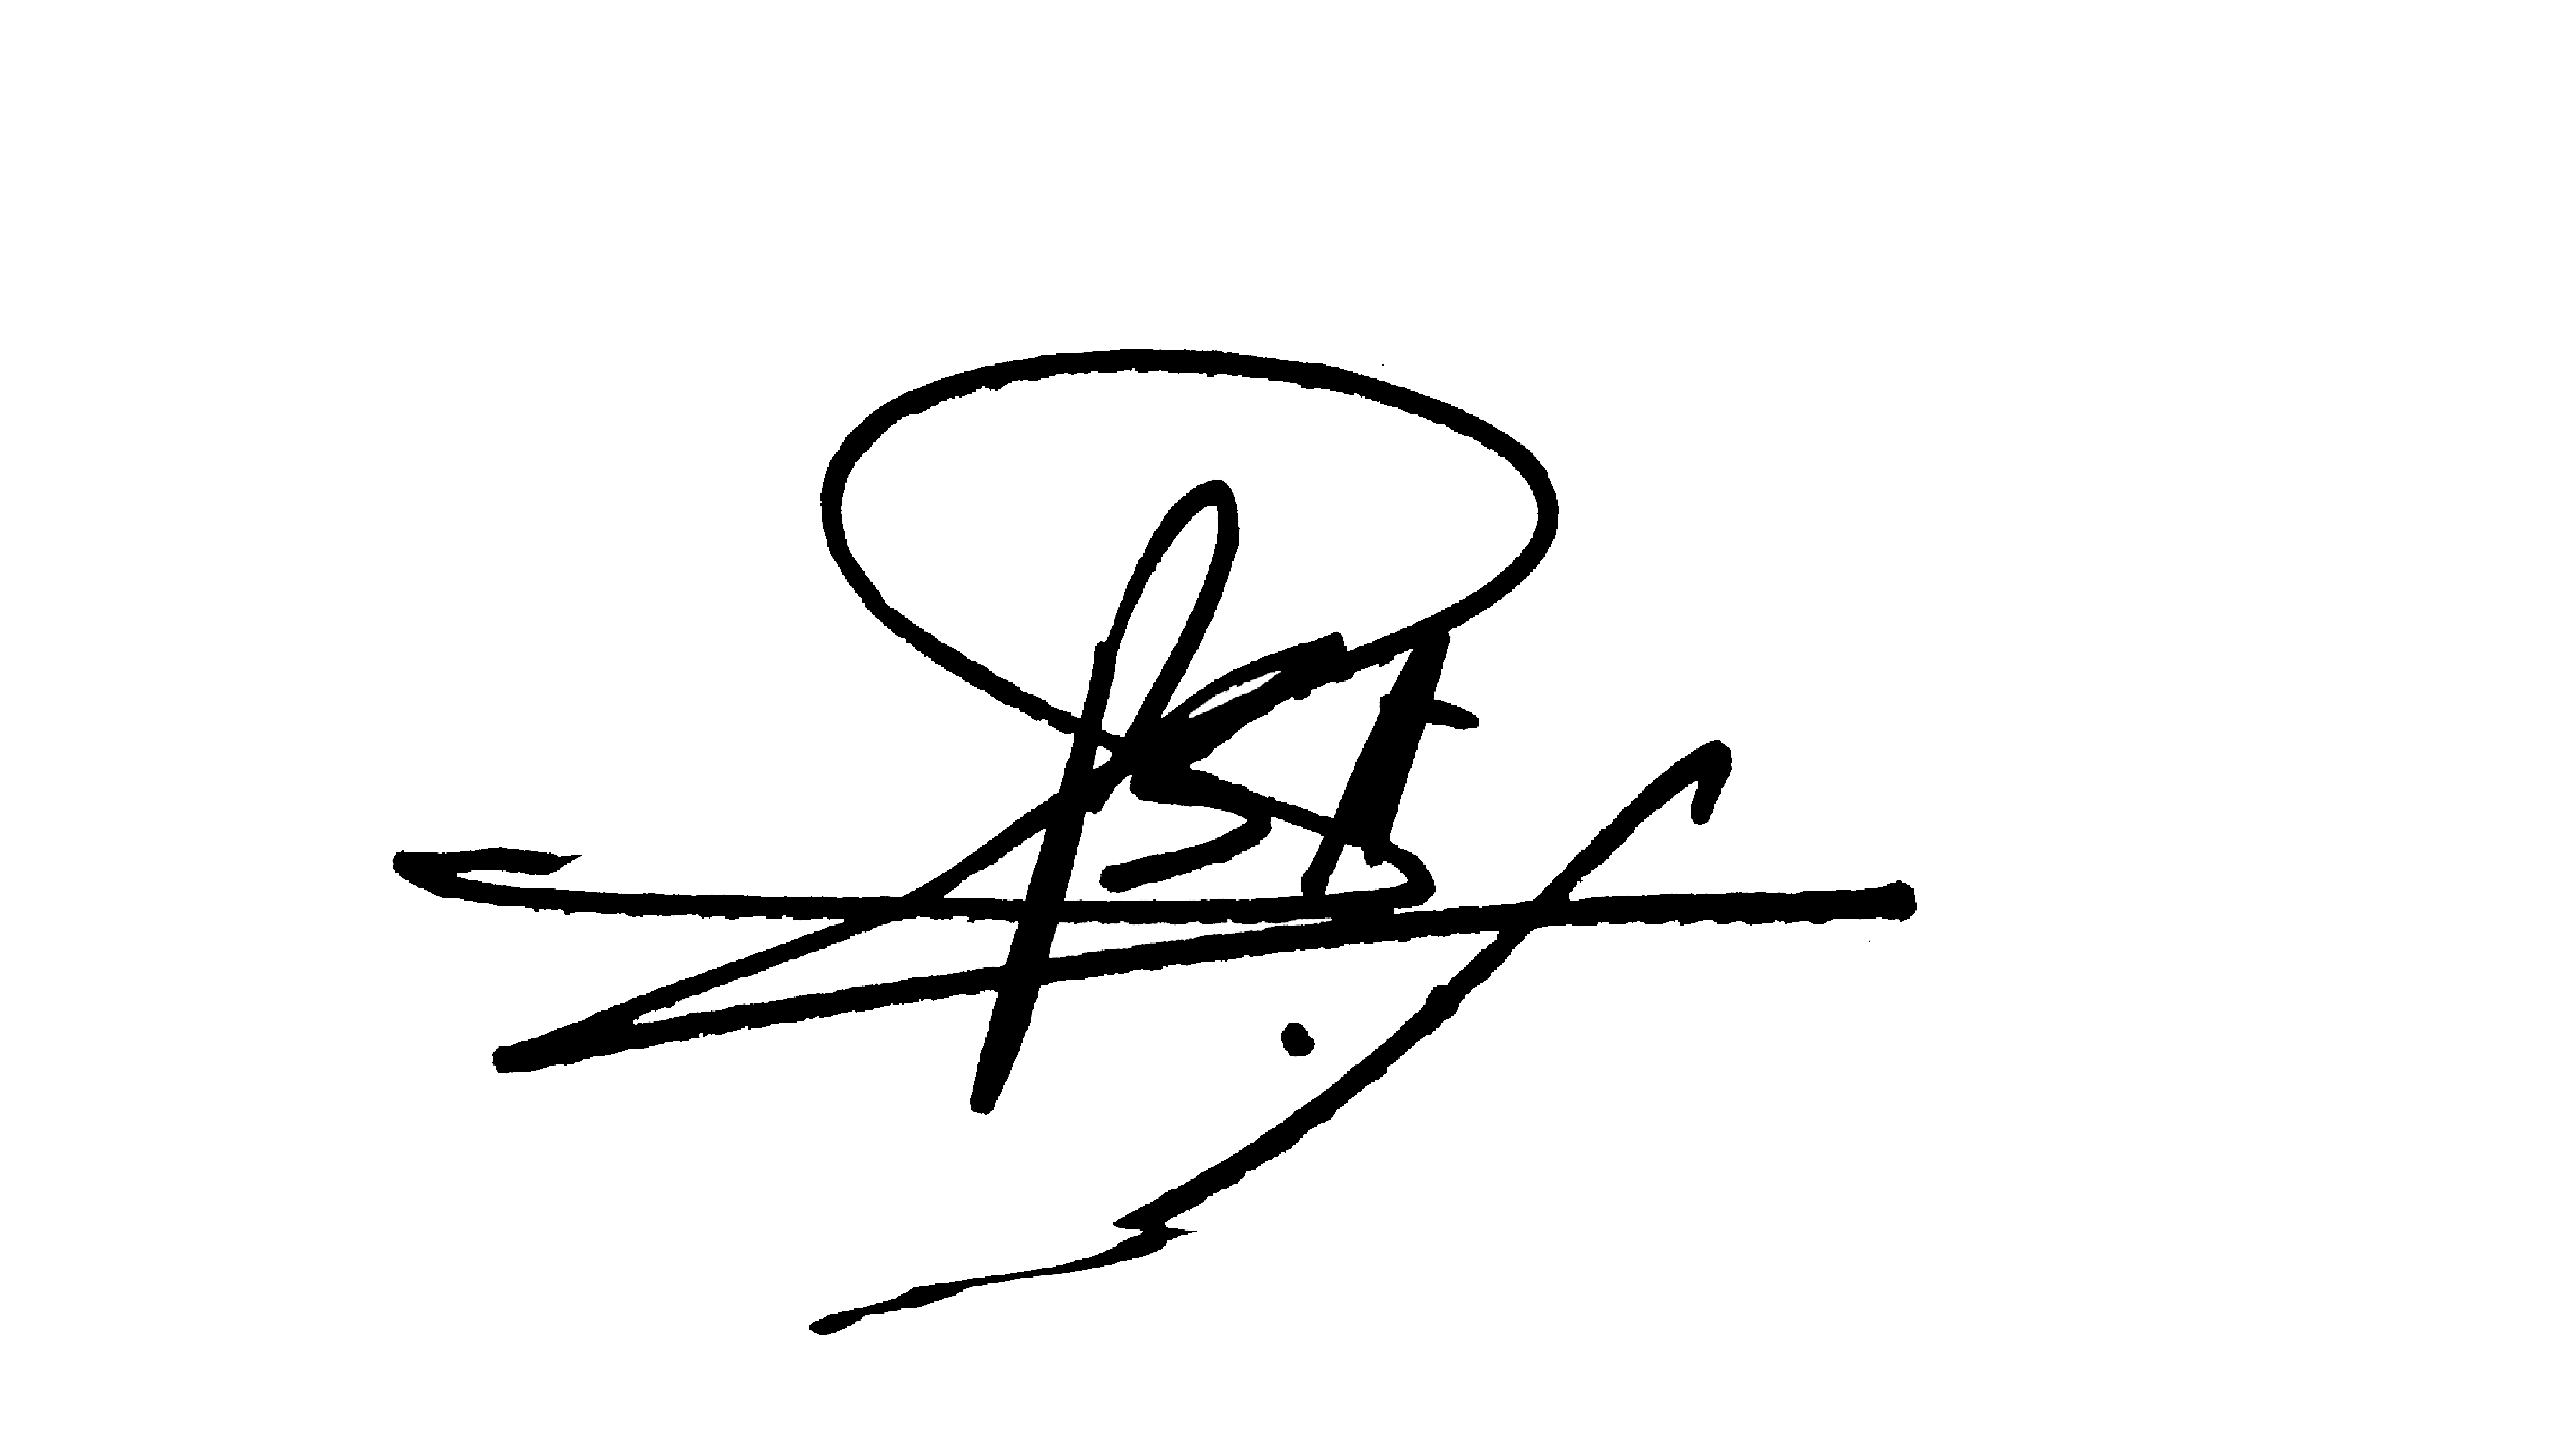 sensiyadigital's Signature